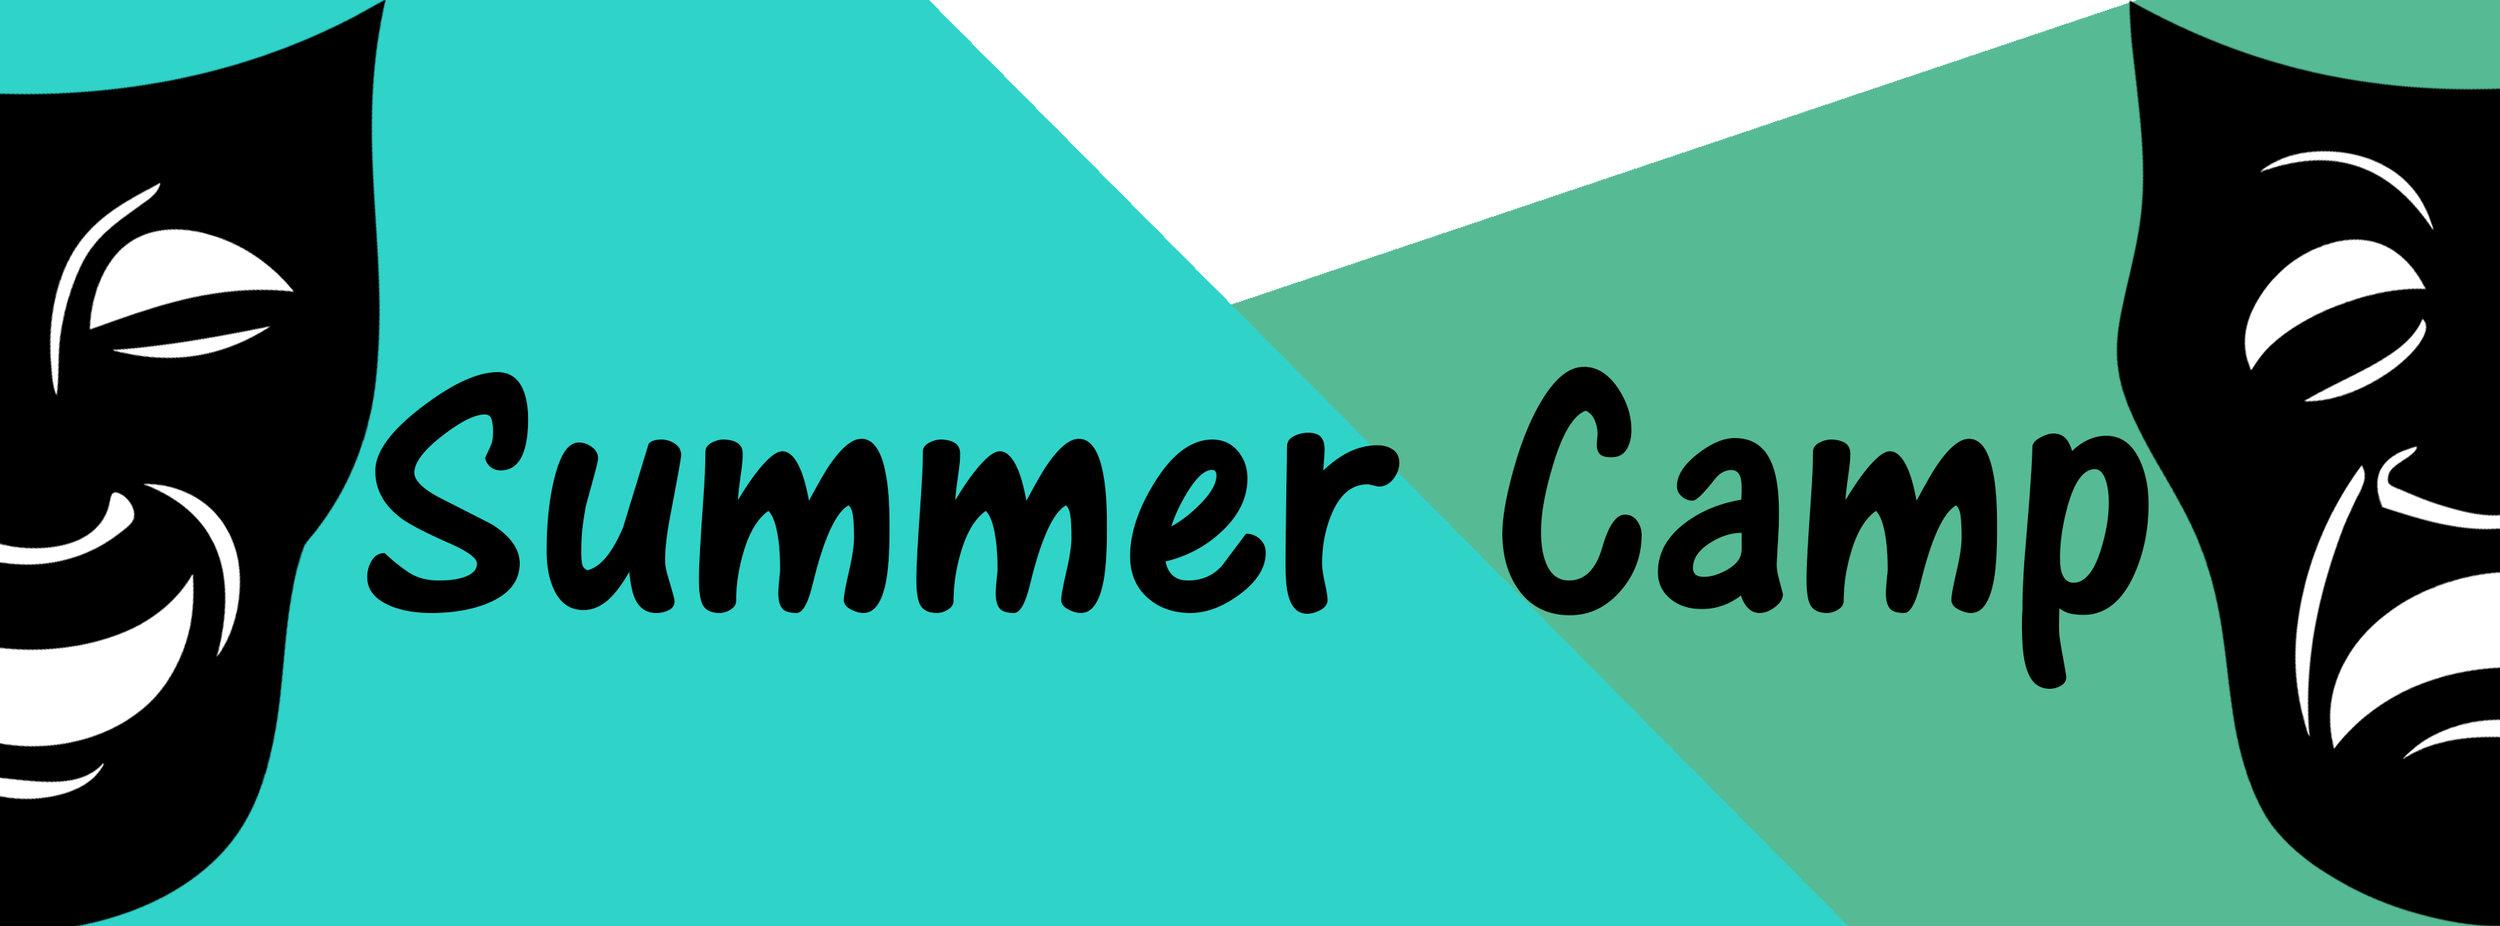 Summer camp 2017.jpg